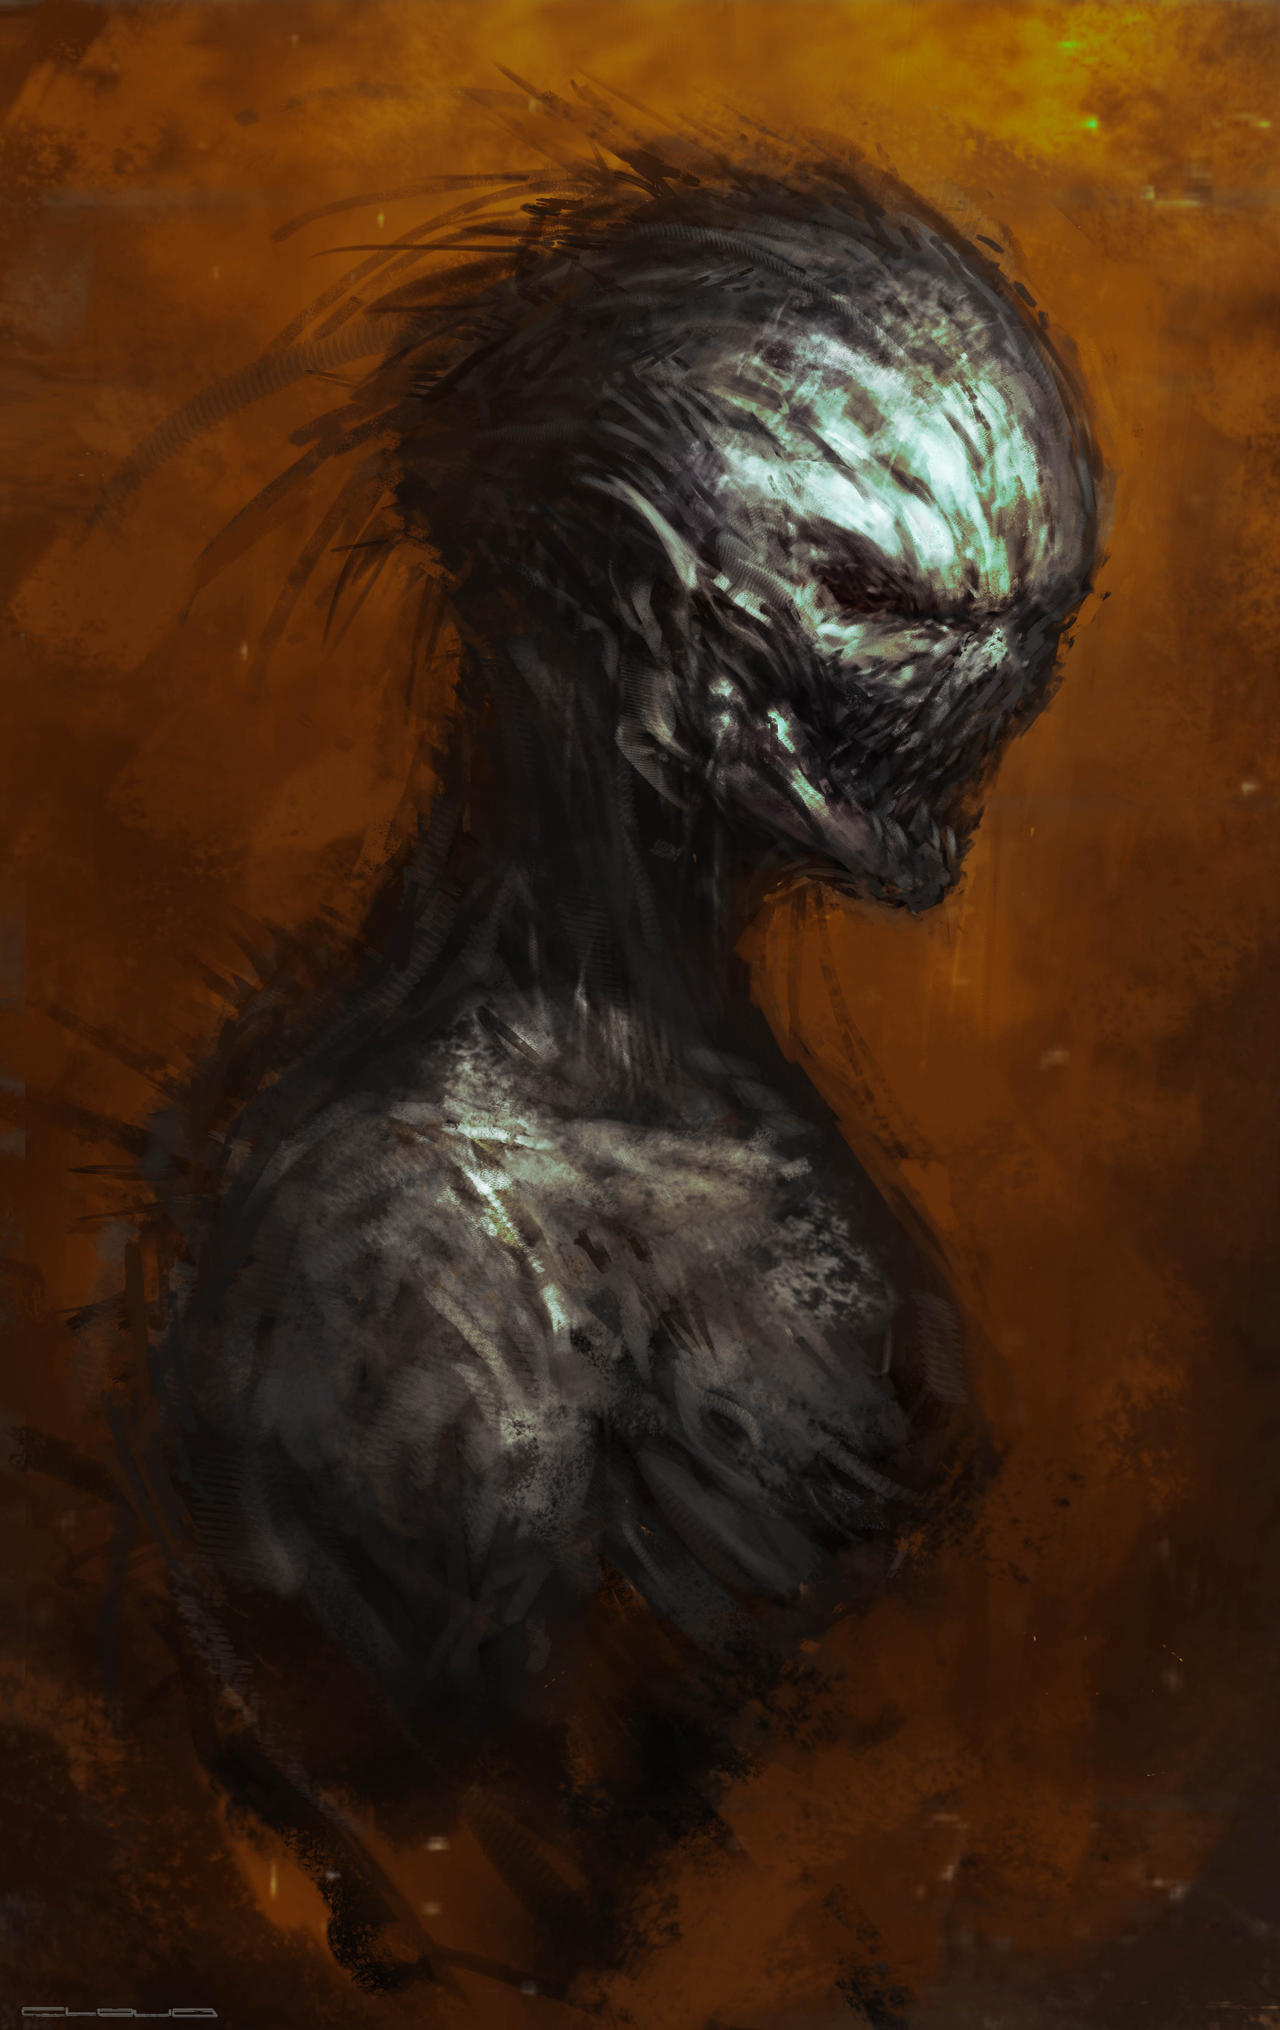 Xerium by Darkcloud013